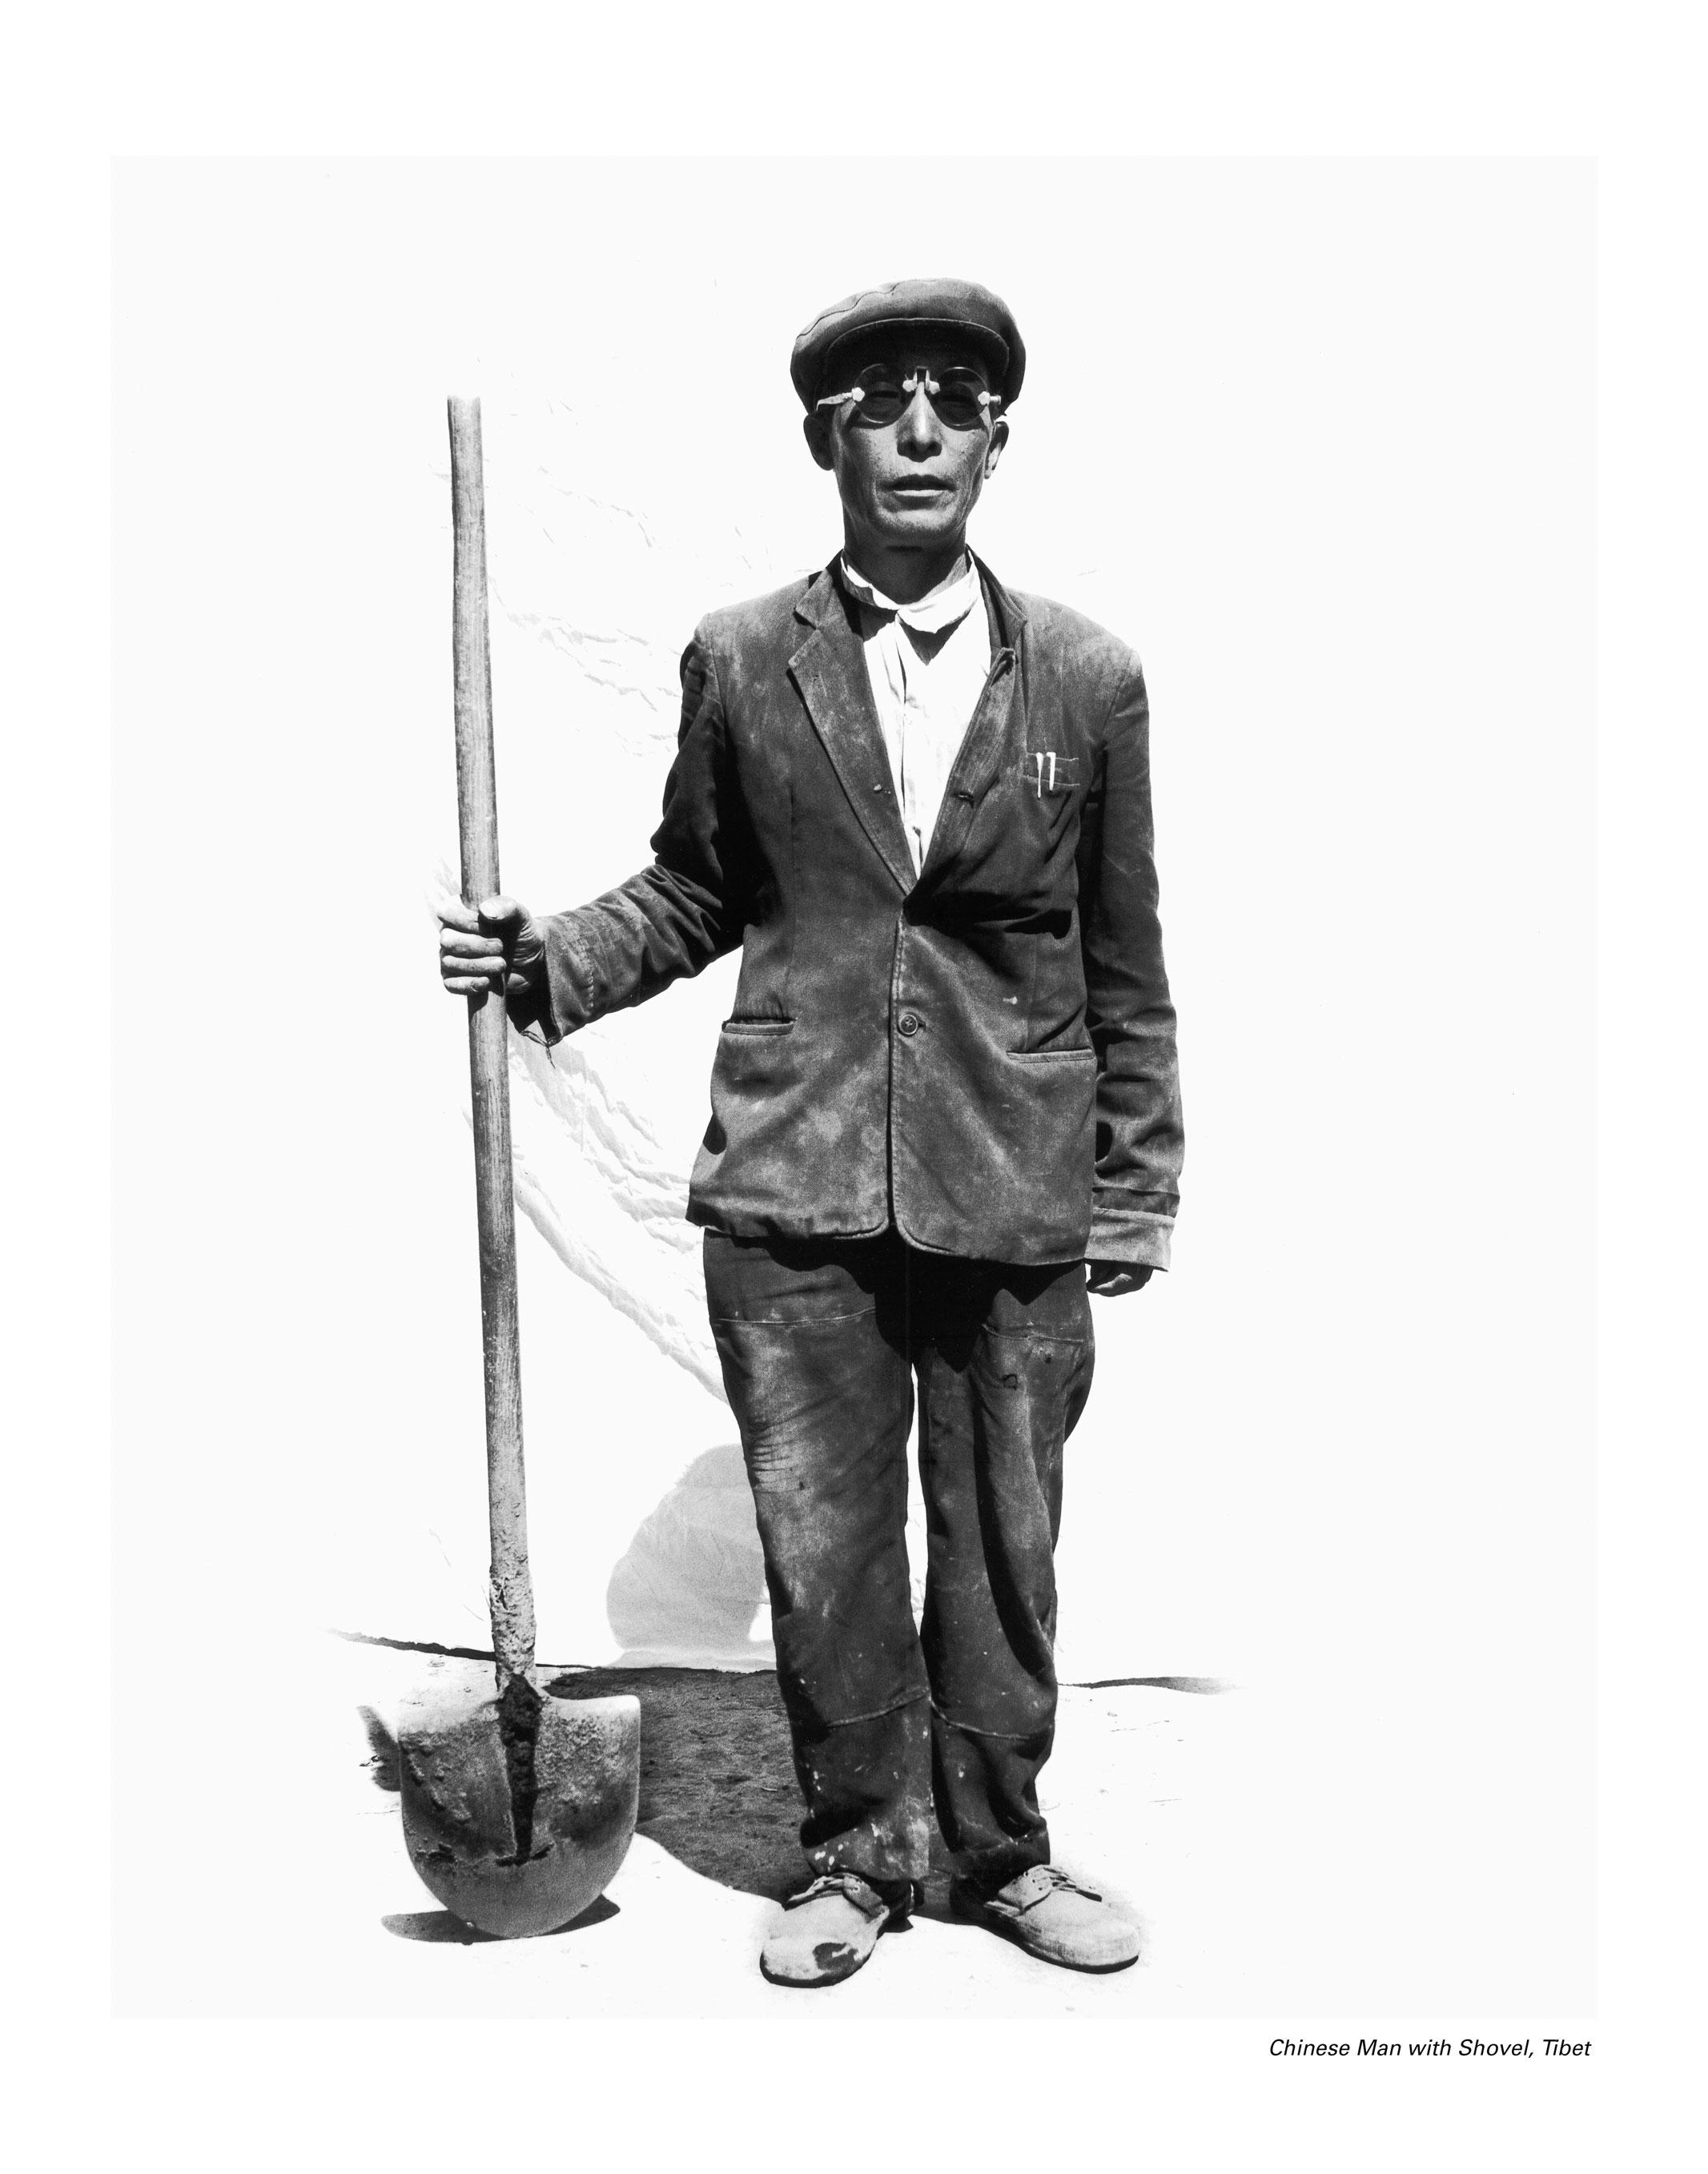 nf_Chinese_Man_With_Shovel_Tibet.jpg